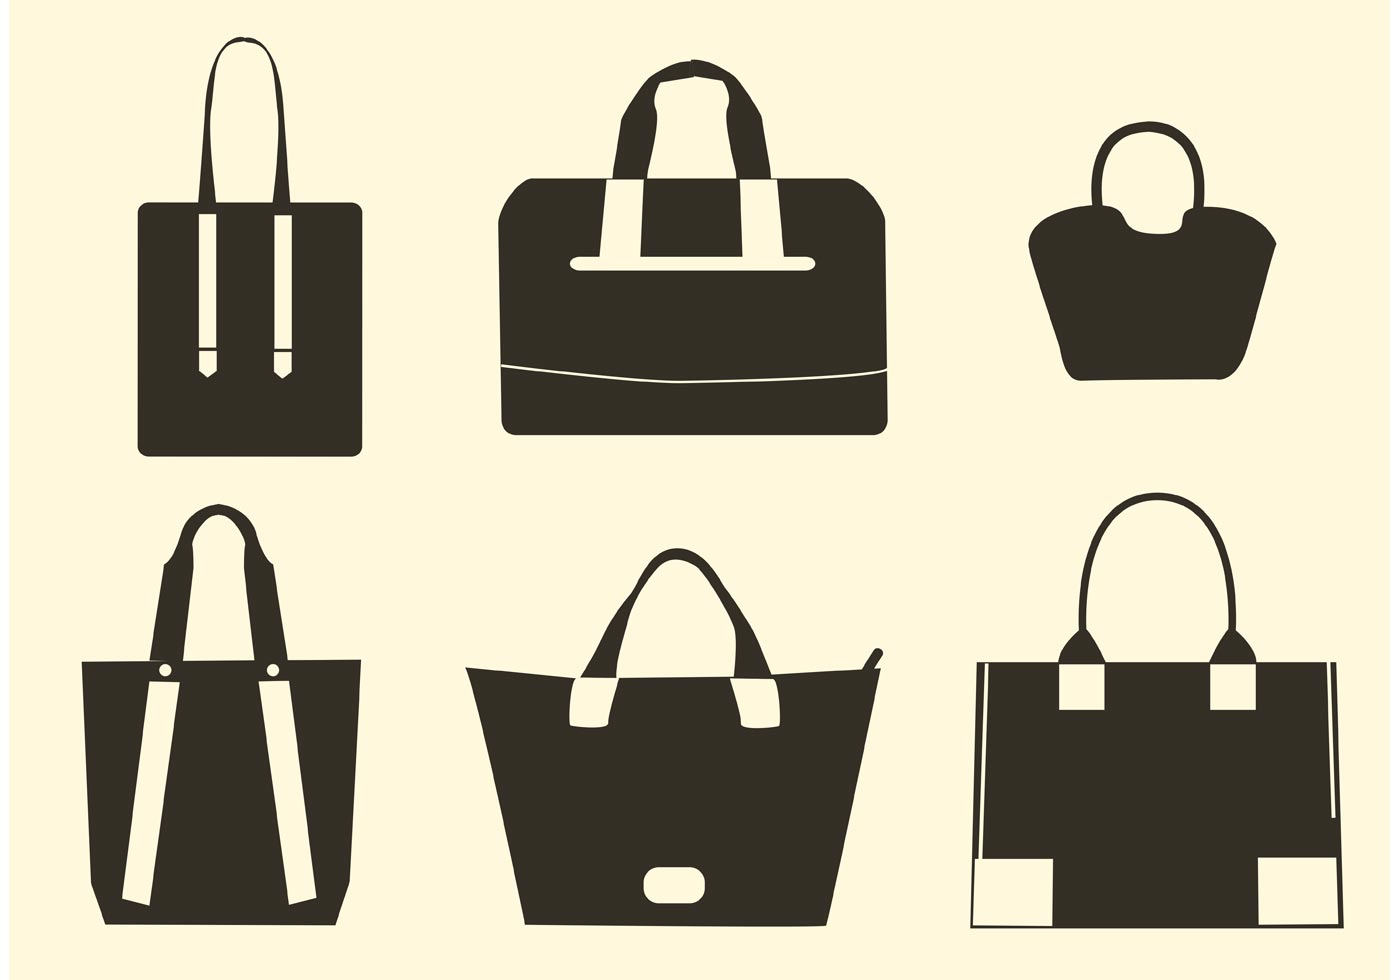 luxury bag free vector art 3841 free downloads rh vecteezy com bag vector photo bag vector free download